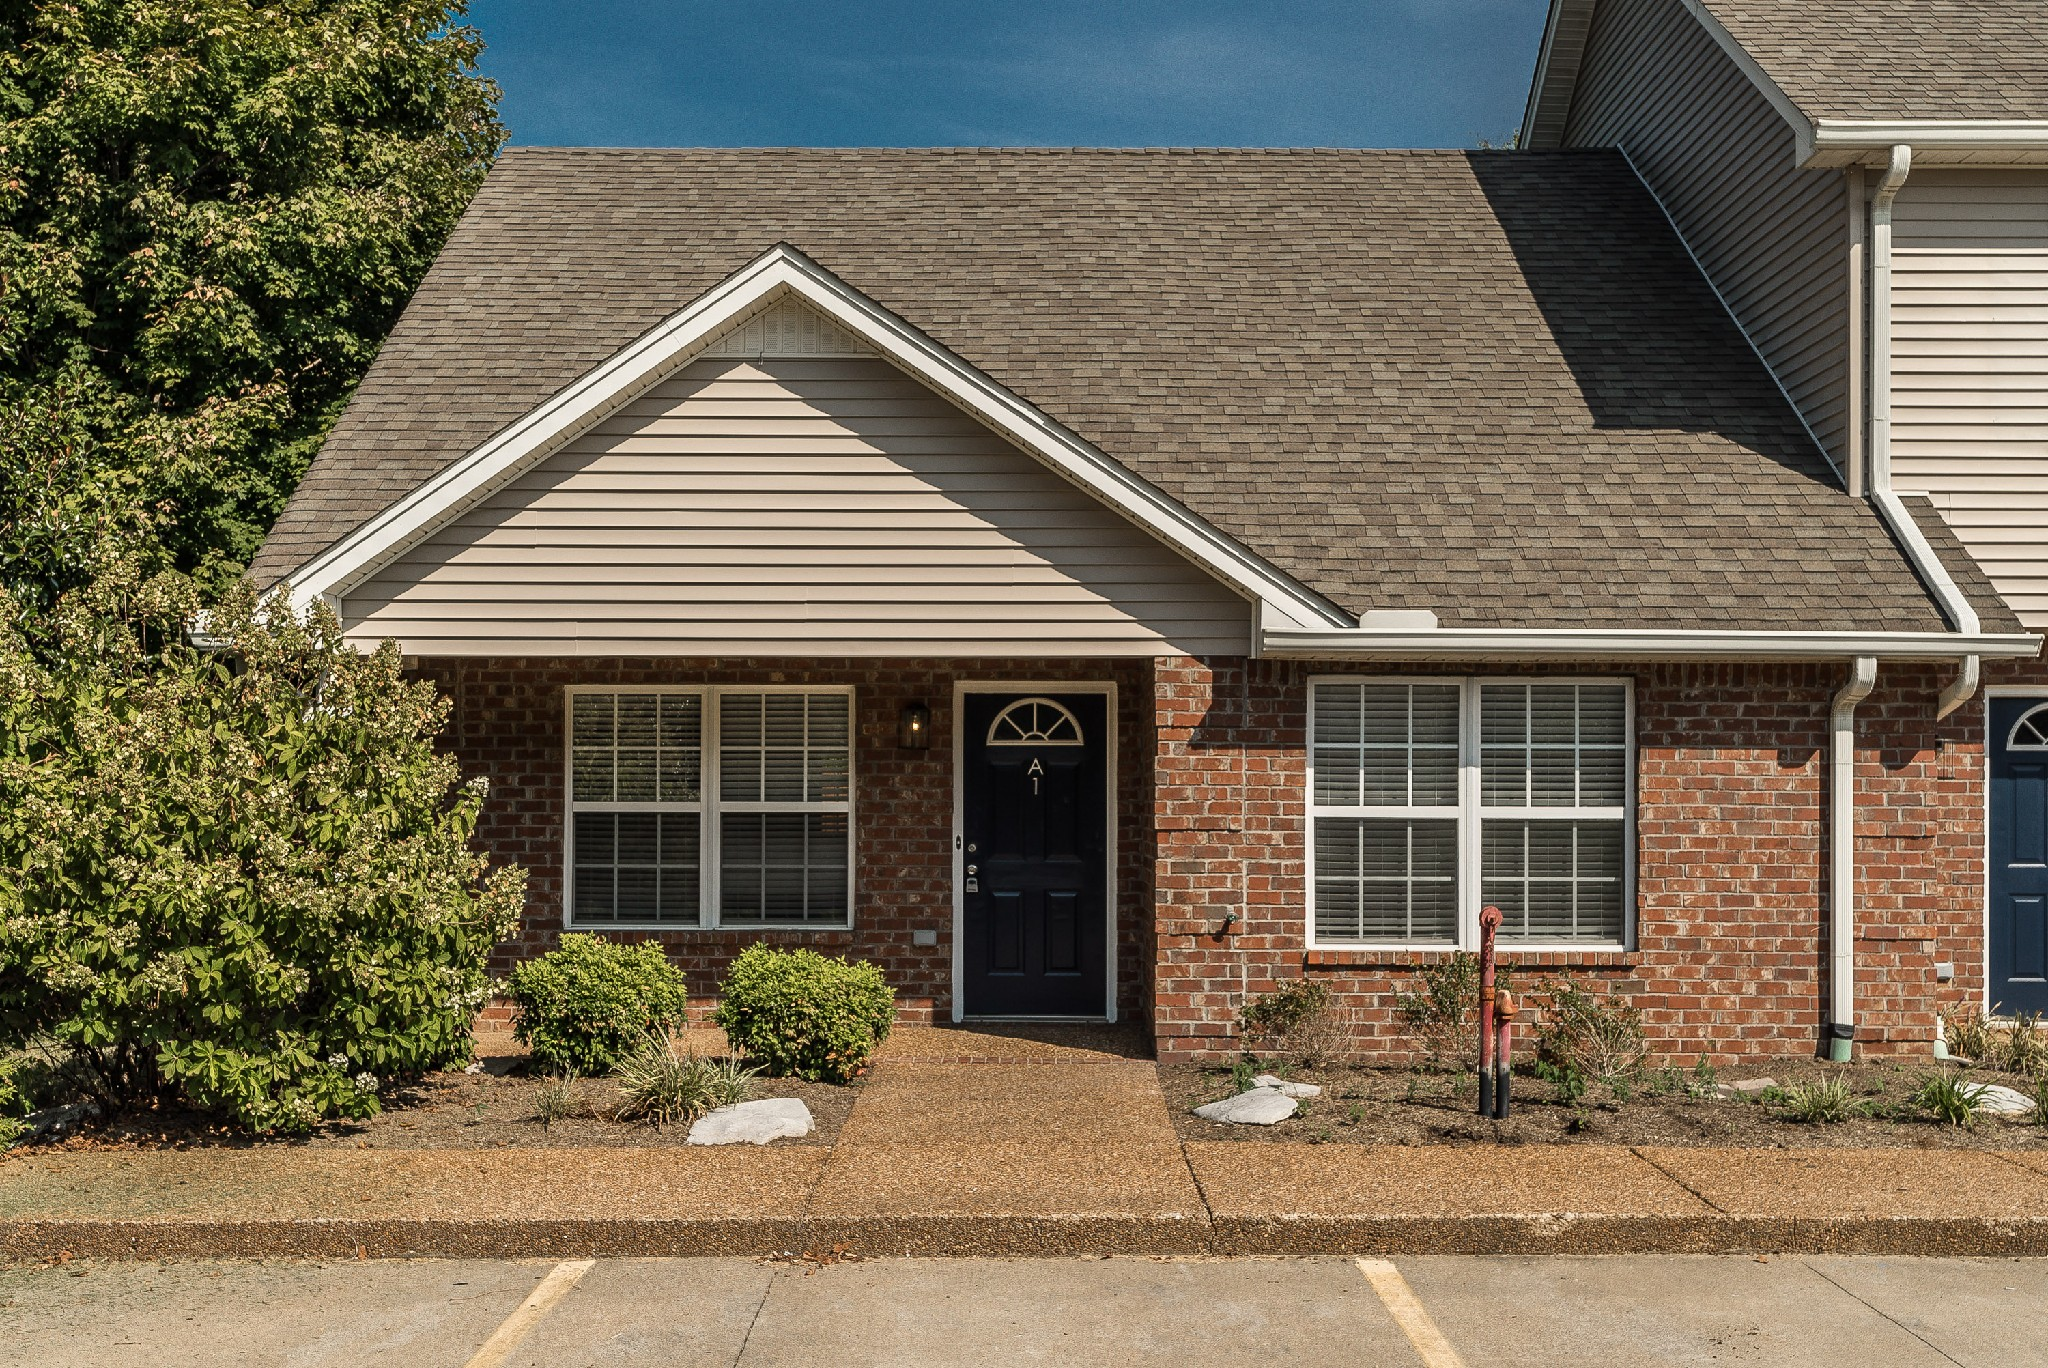 138 Cambridge Dr Unit C1, Gallatin, TN 37066 - Gallatin, TN real estate listing